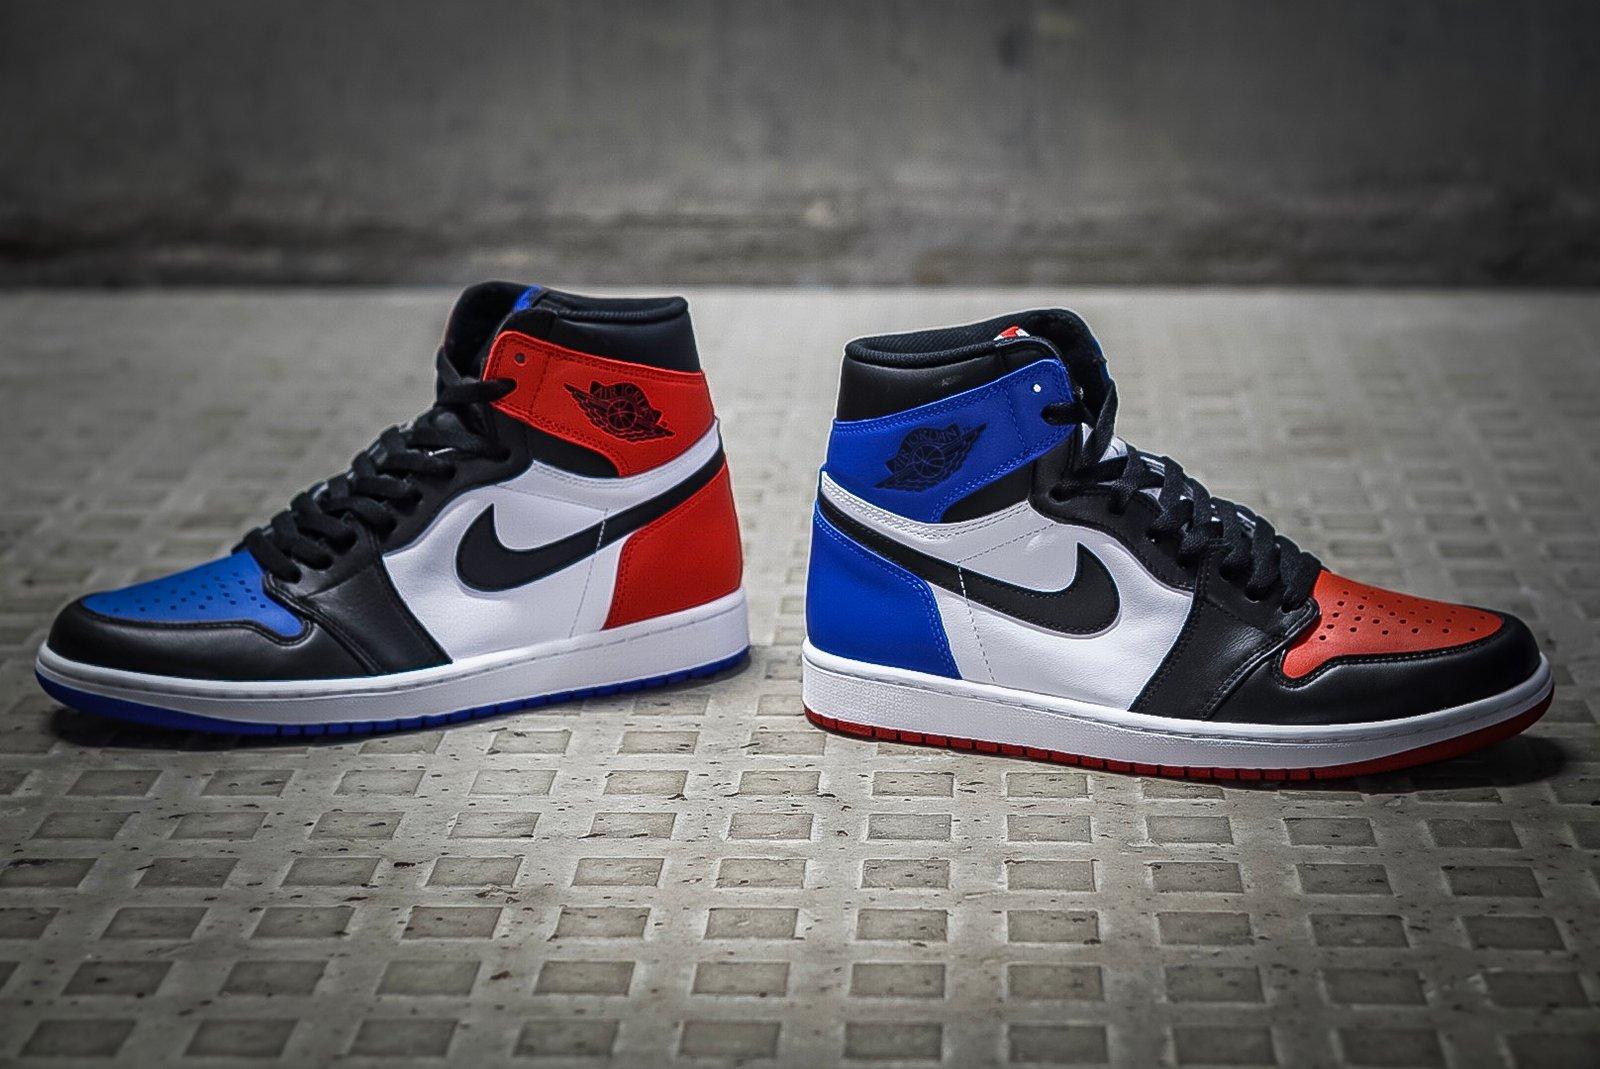 Nike Air Jordan 1 Top 3l CUSTOM (MADE